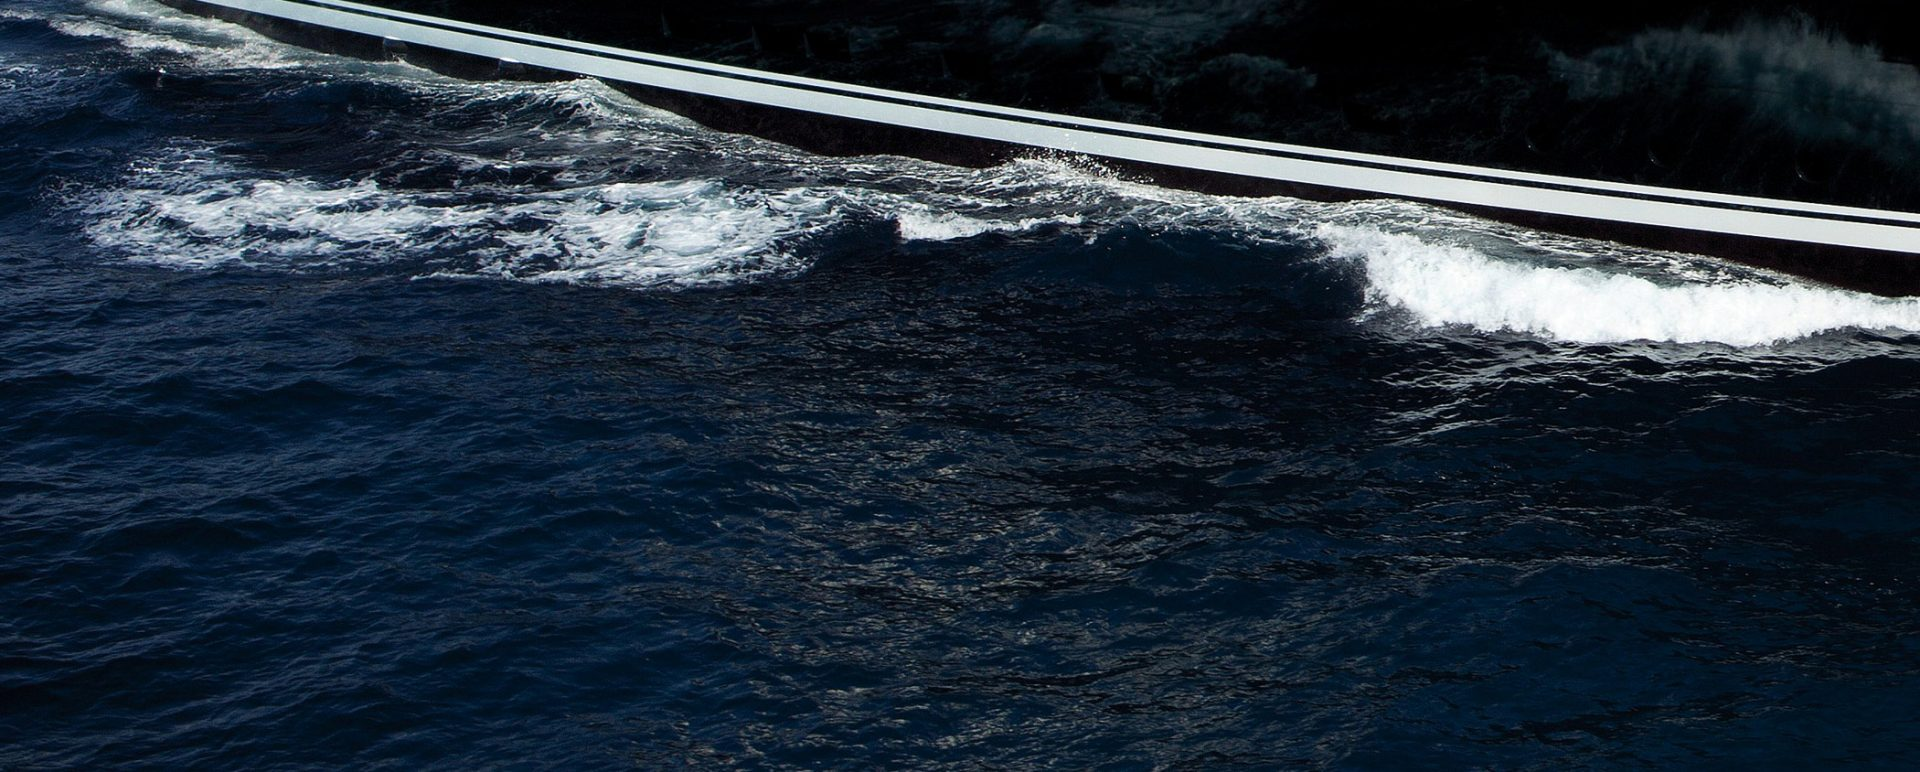 vitruvius yachts projects